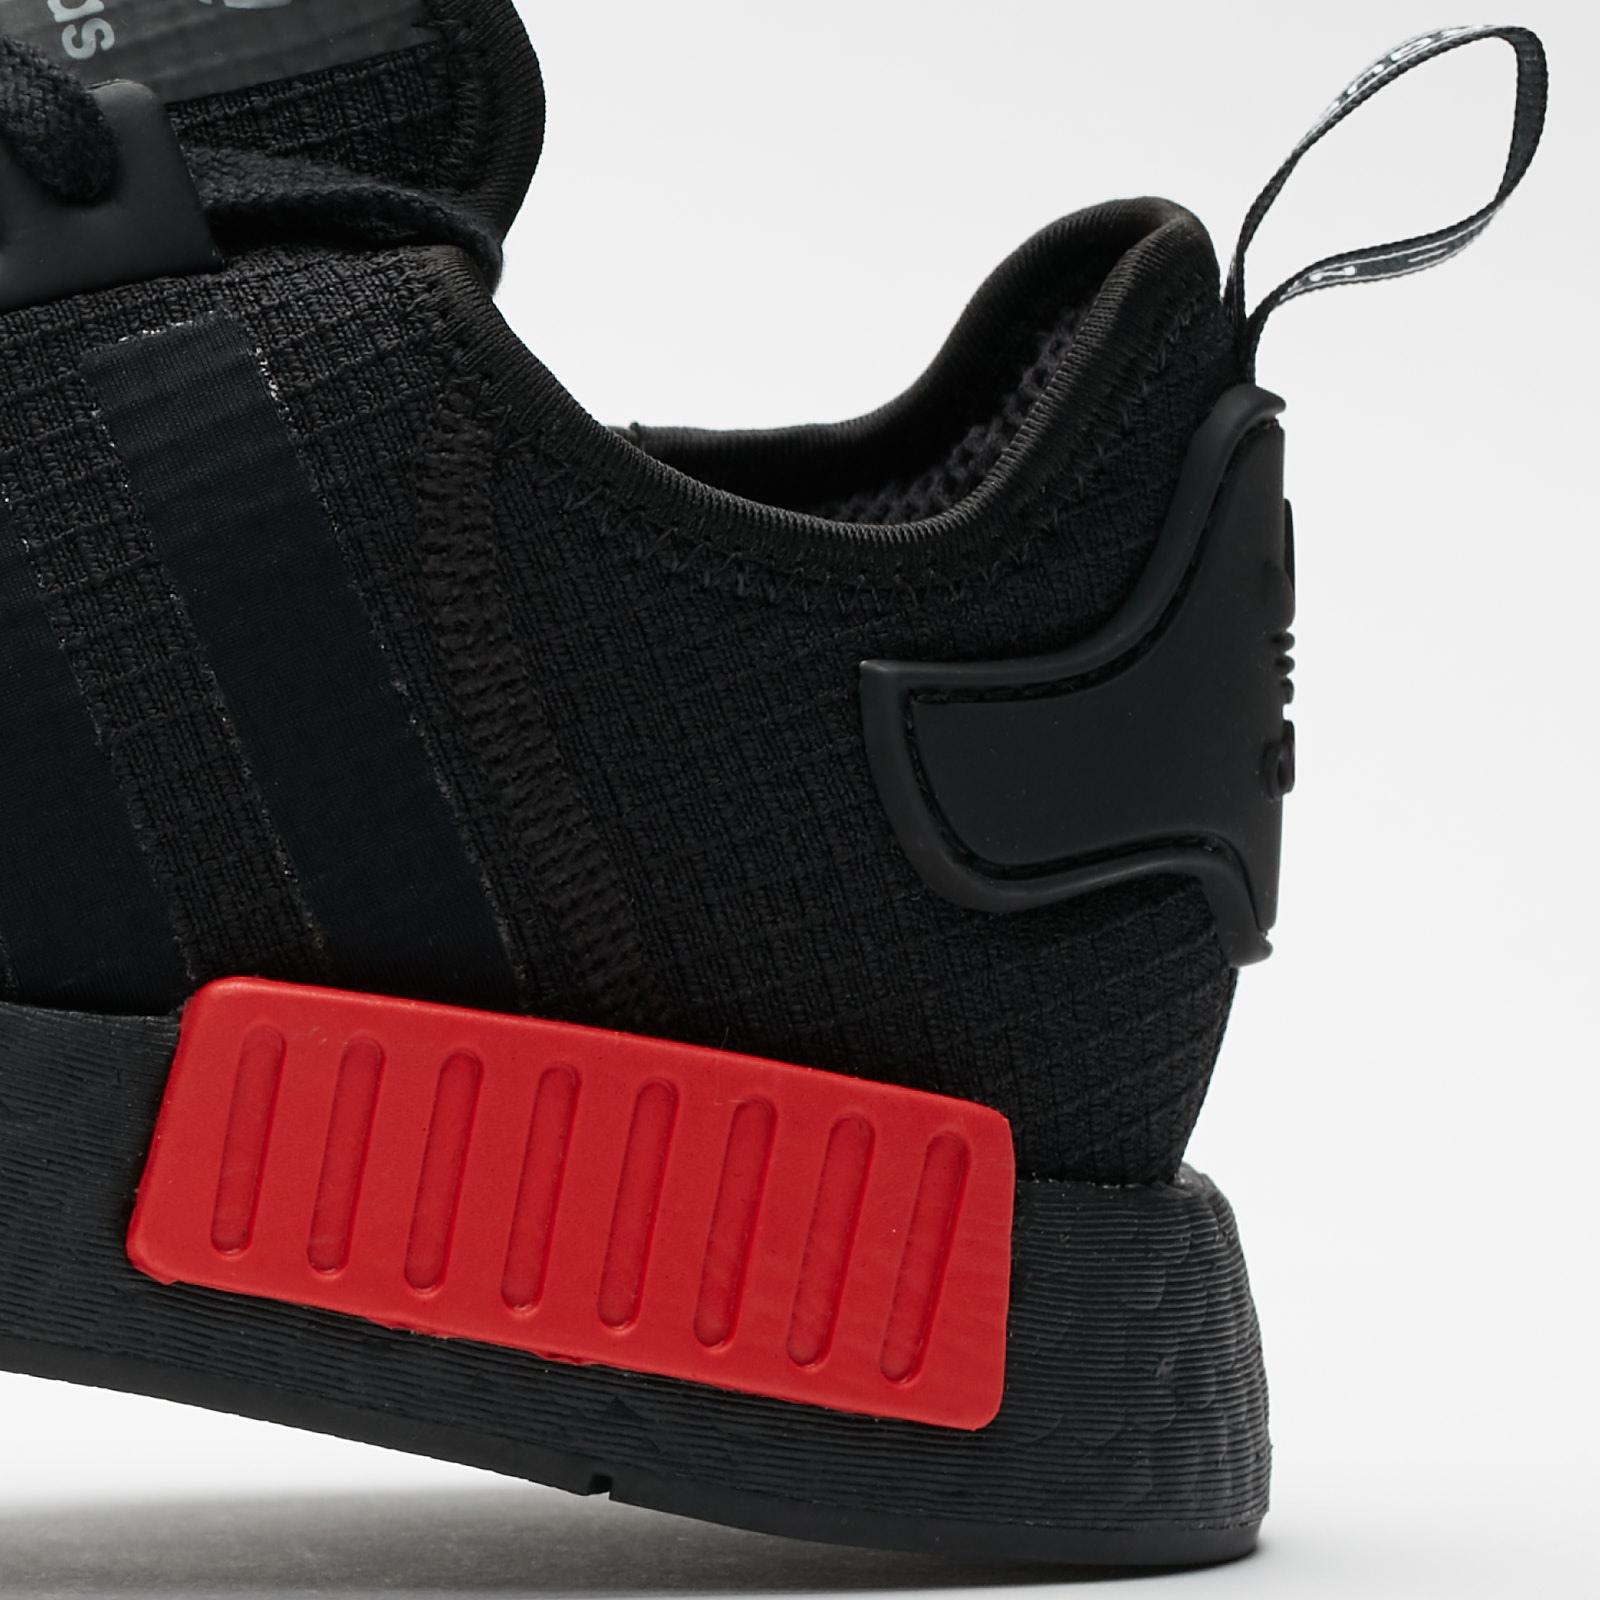 adidas NMD_R1 - B37618 - Sneakersnstuff